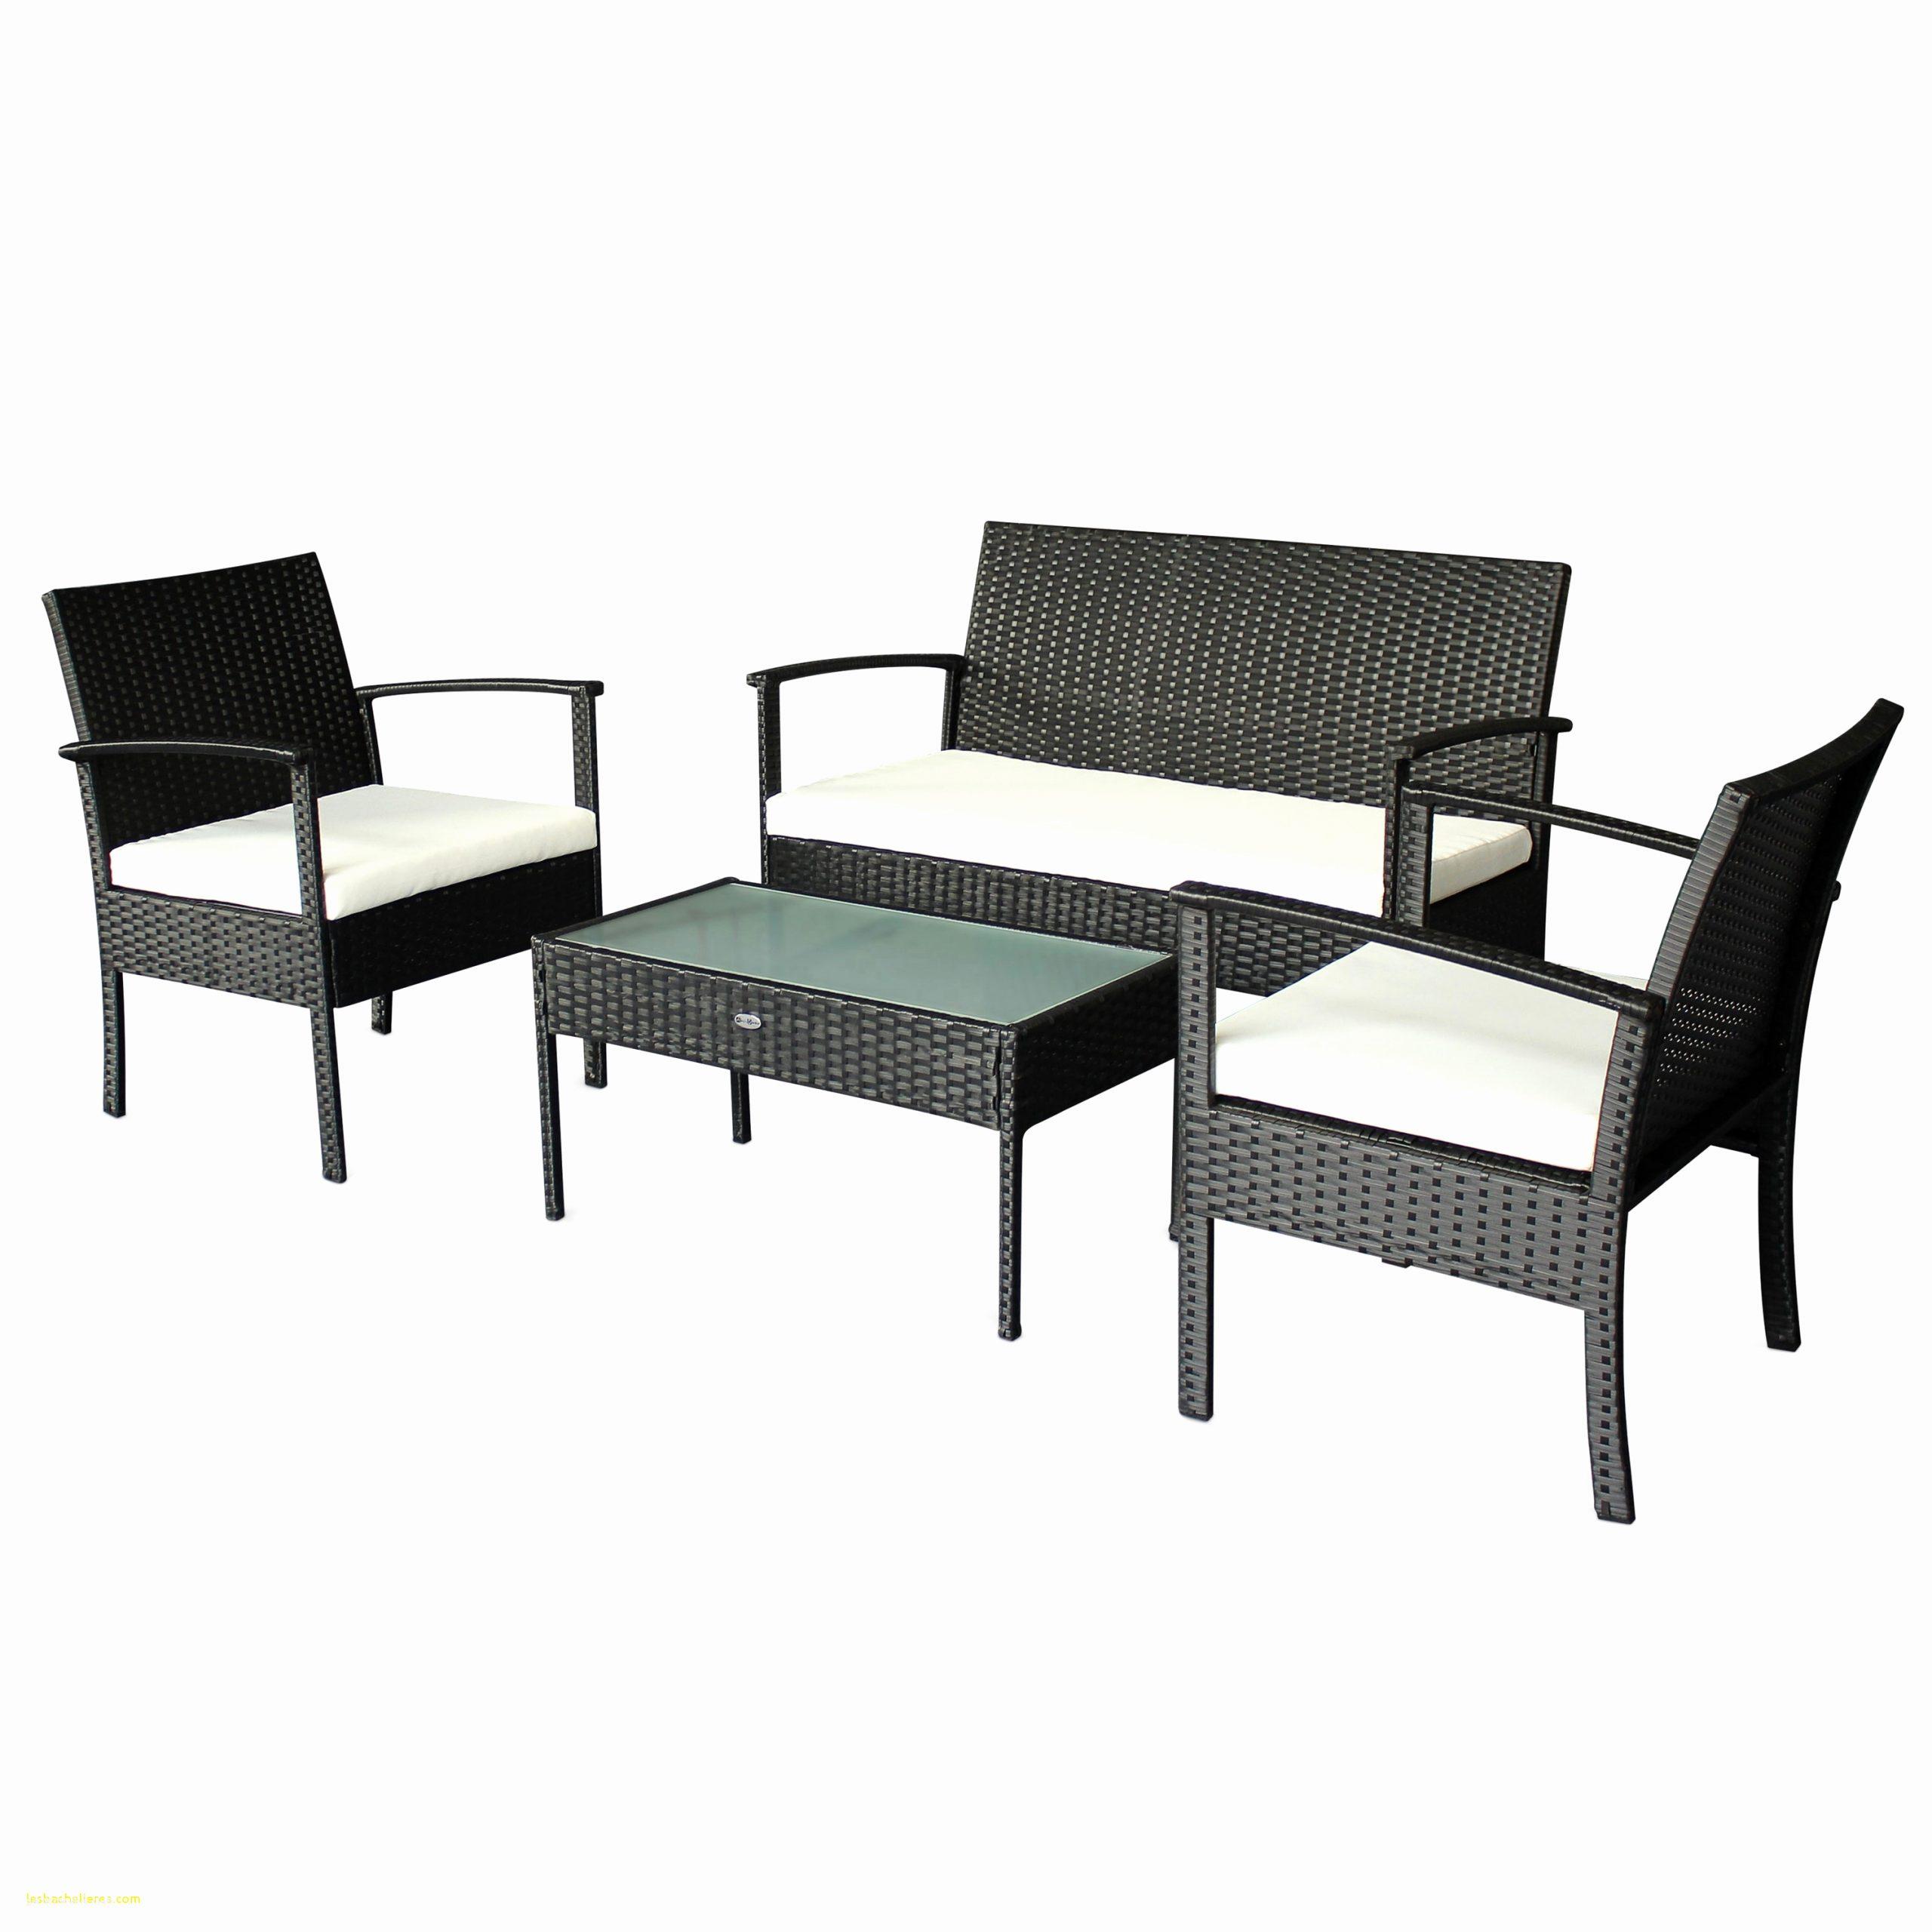 Source D'inspiration Table Bistro Haute - Luckytroll encequiconcerne Table Basse De Jardin Ikea